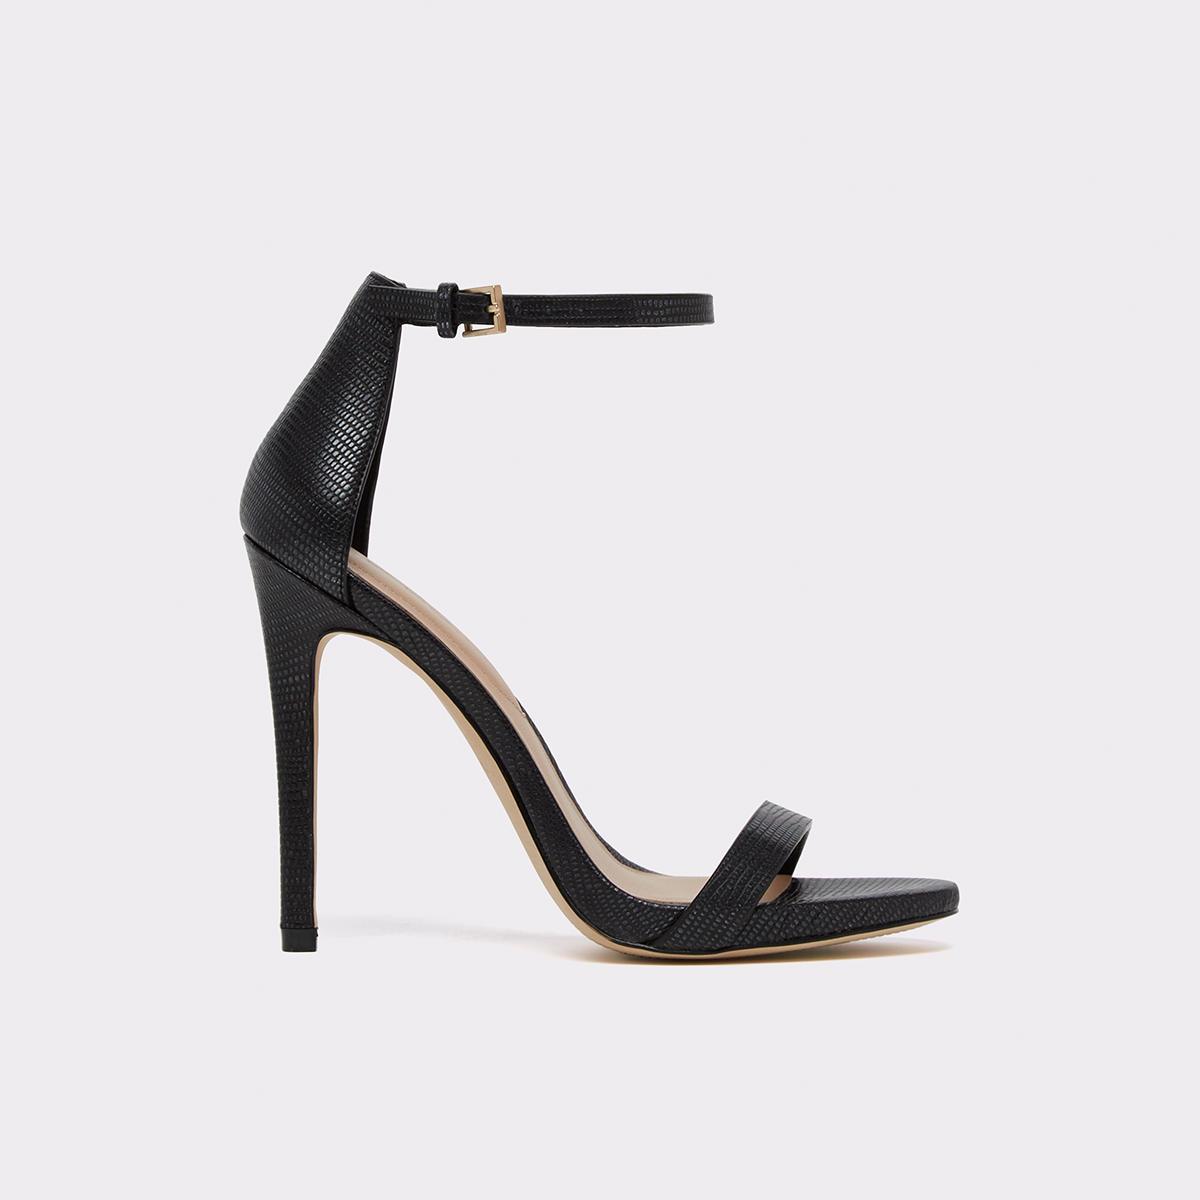 Aldo Shoes Sandals Heels Style Guru Fashion Glitz